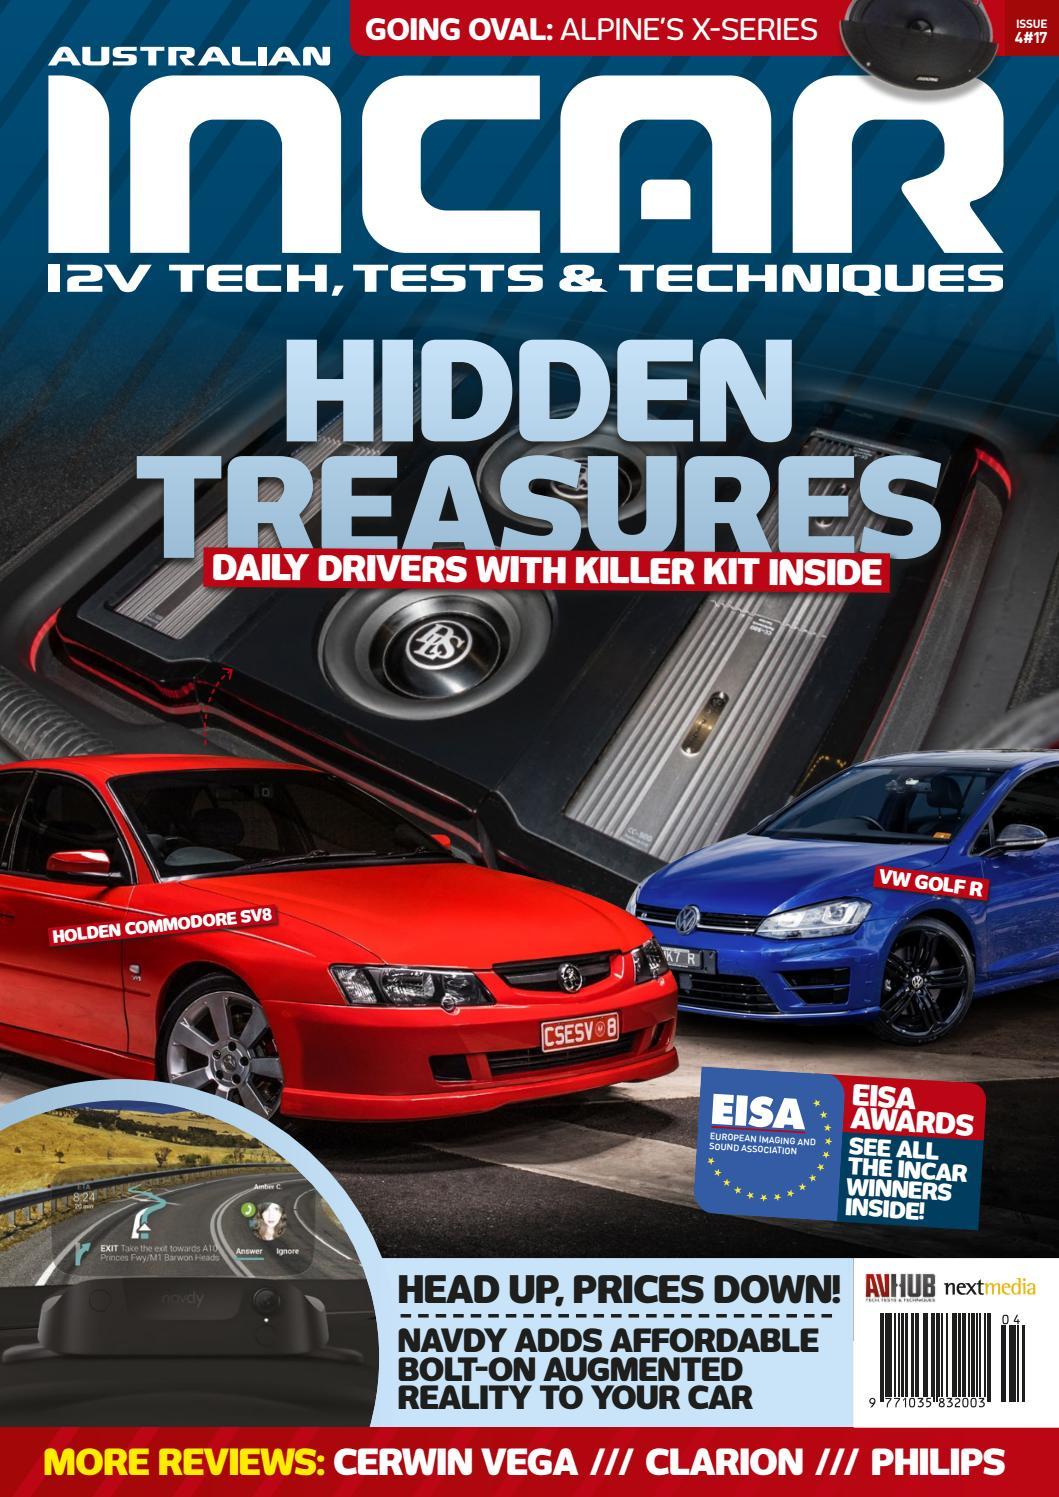 Australian Incar Magazine Issue 20174 By Nextmedia Pty Ltd Issuu Diagram Also Kenwood Double Din Car Stereo Further 2016 Sport Cars